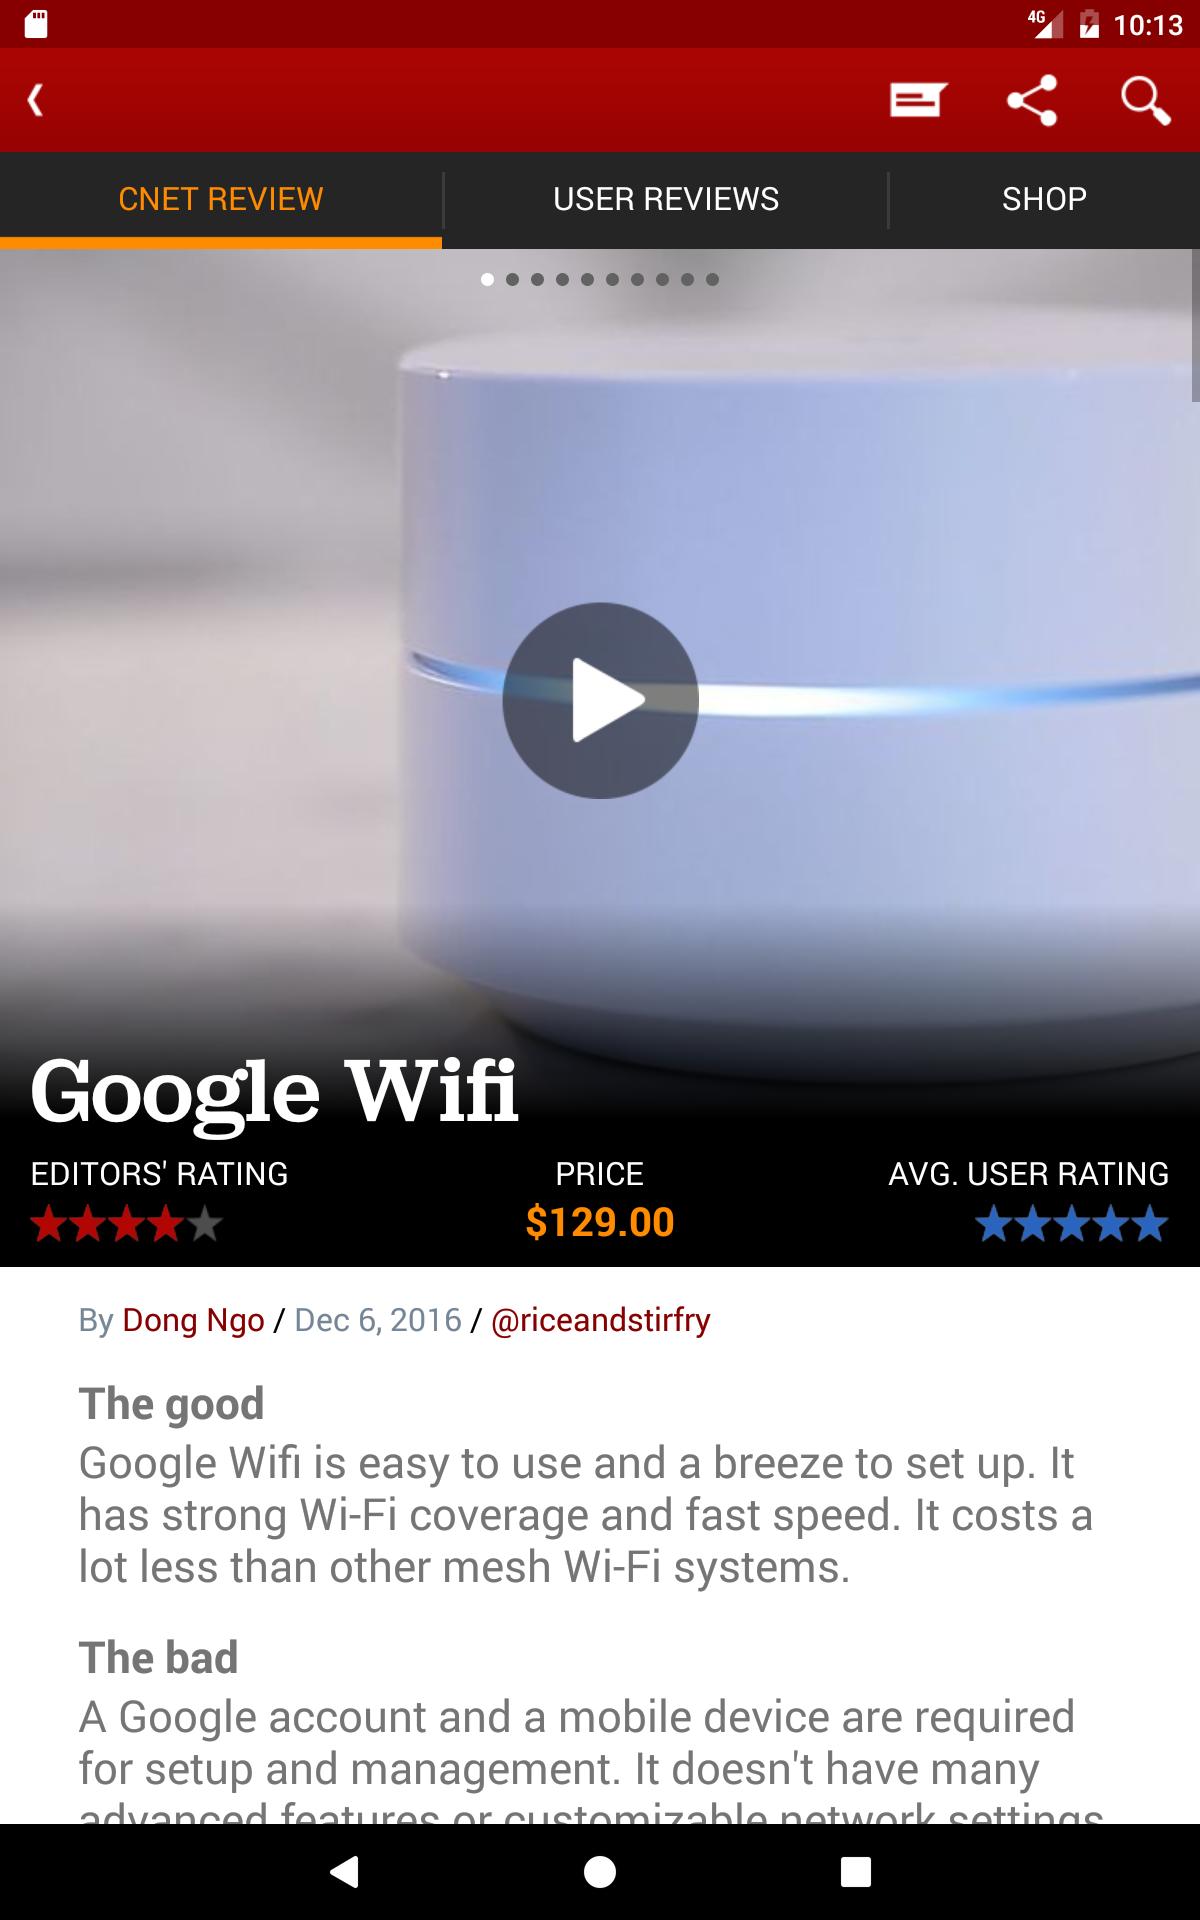 adobe reader 11 free download for windows 7 cnet